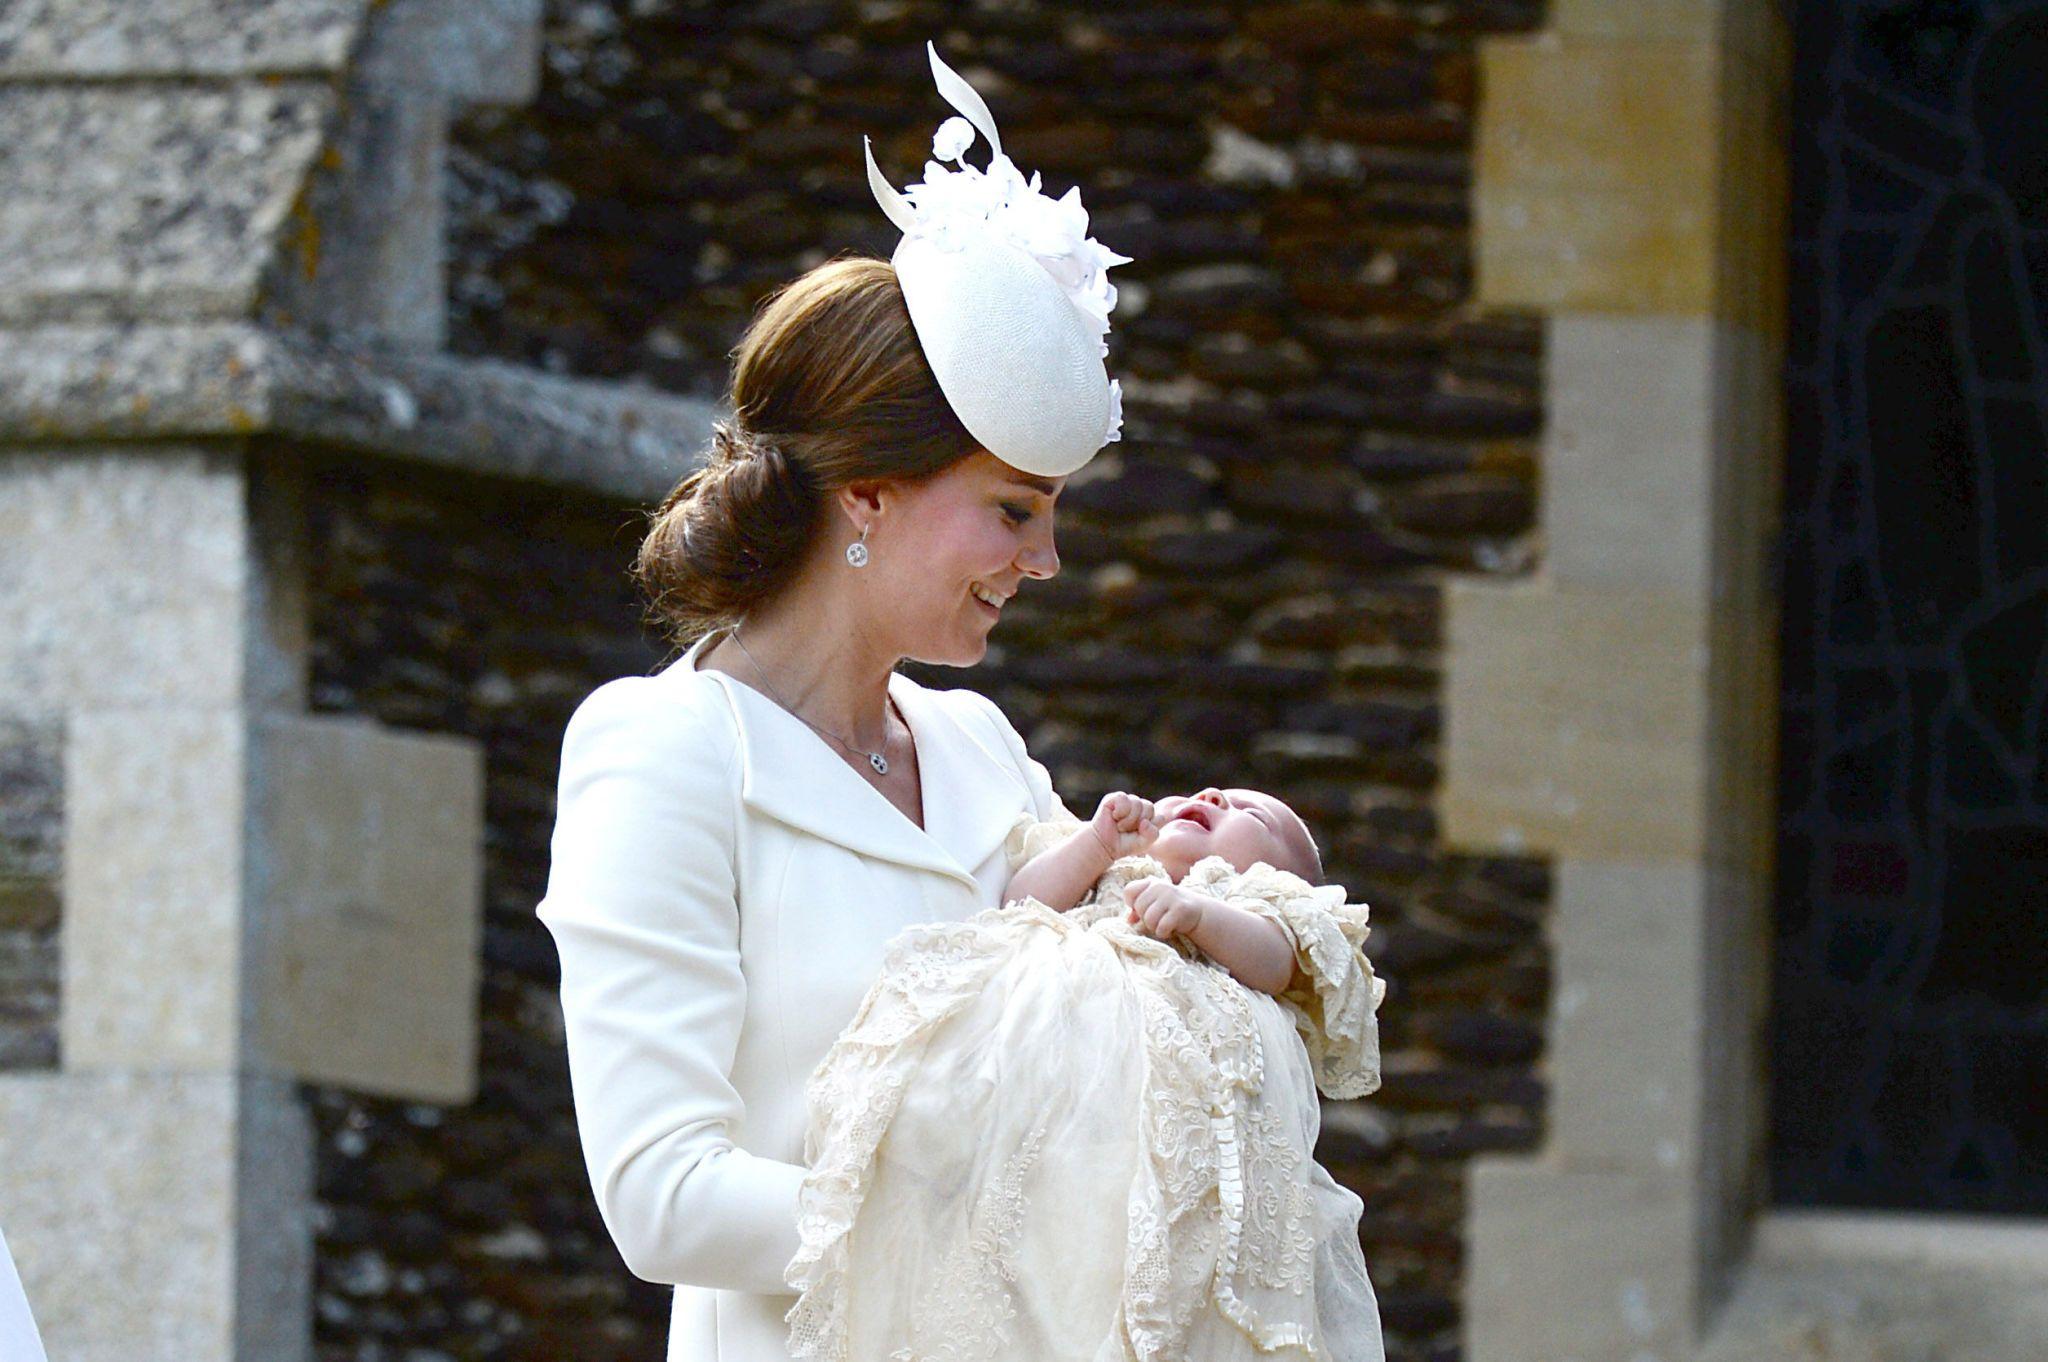 Why Princess Charlotte Won't Wear a Dress Until Her Next Birthday